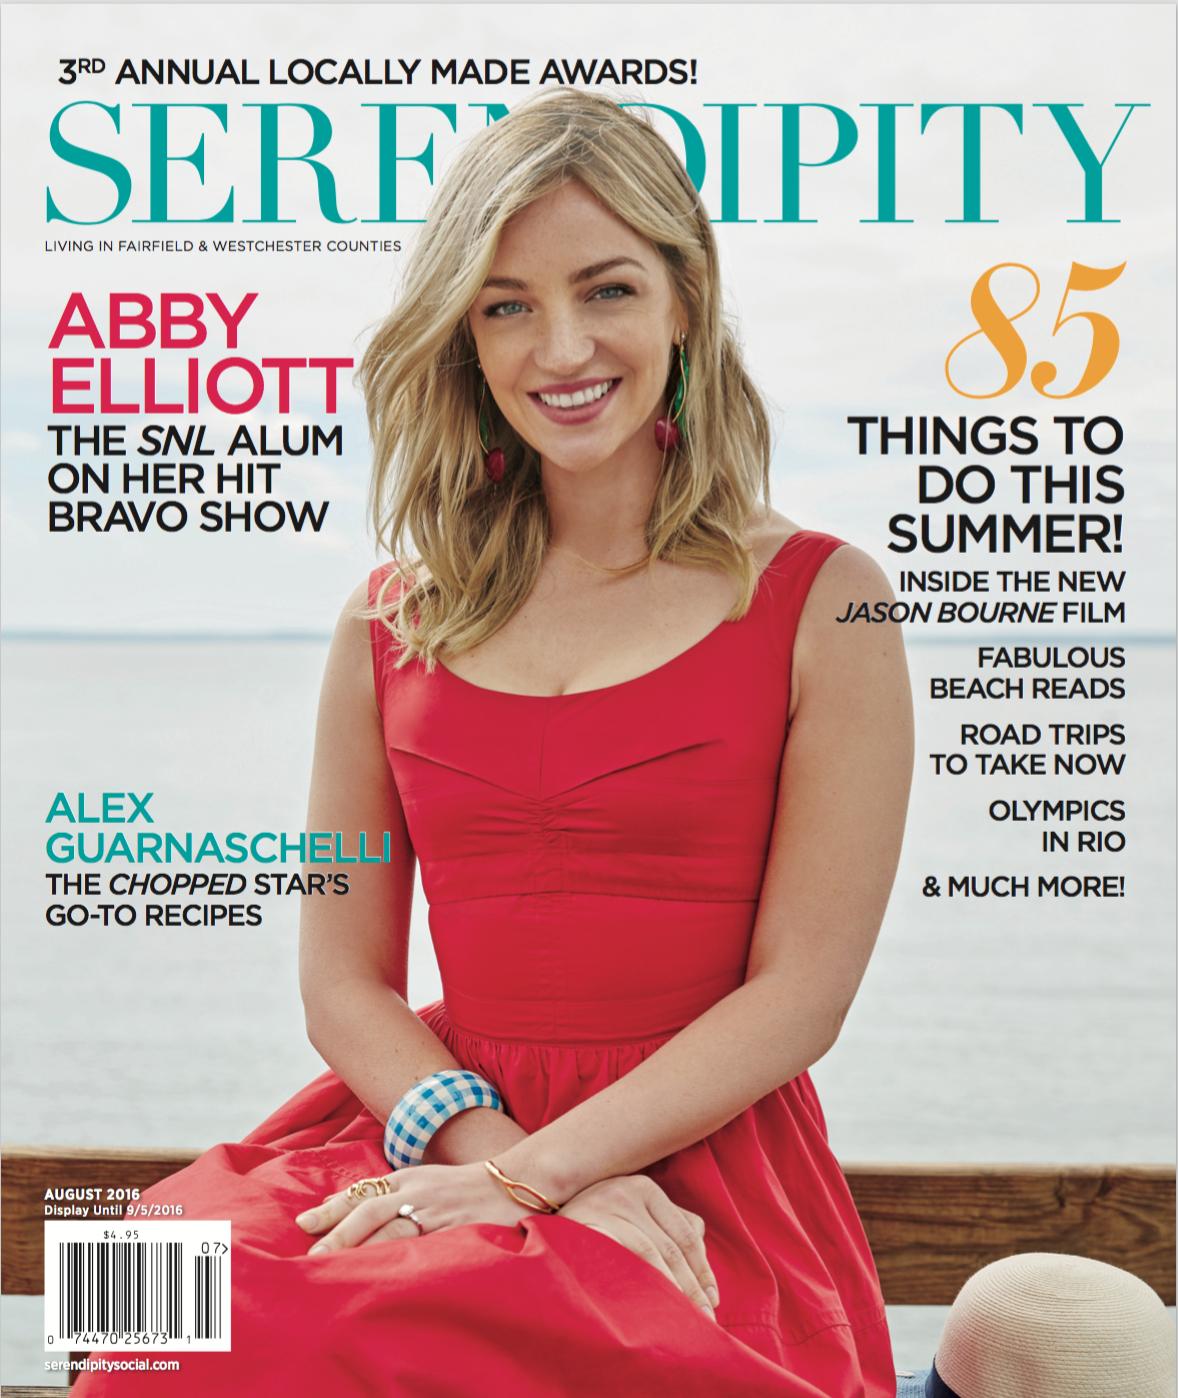 Serendipity Cover Abby Elliott